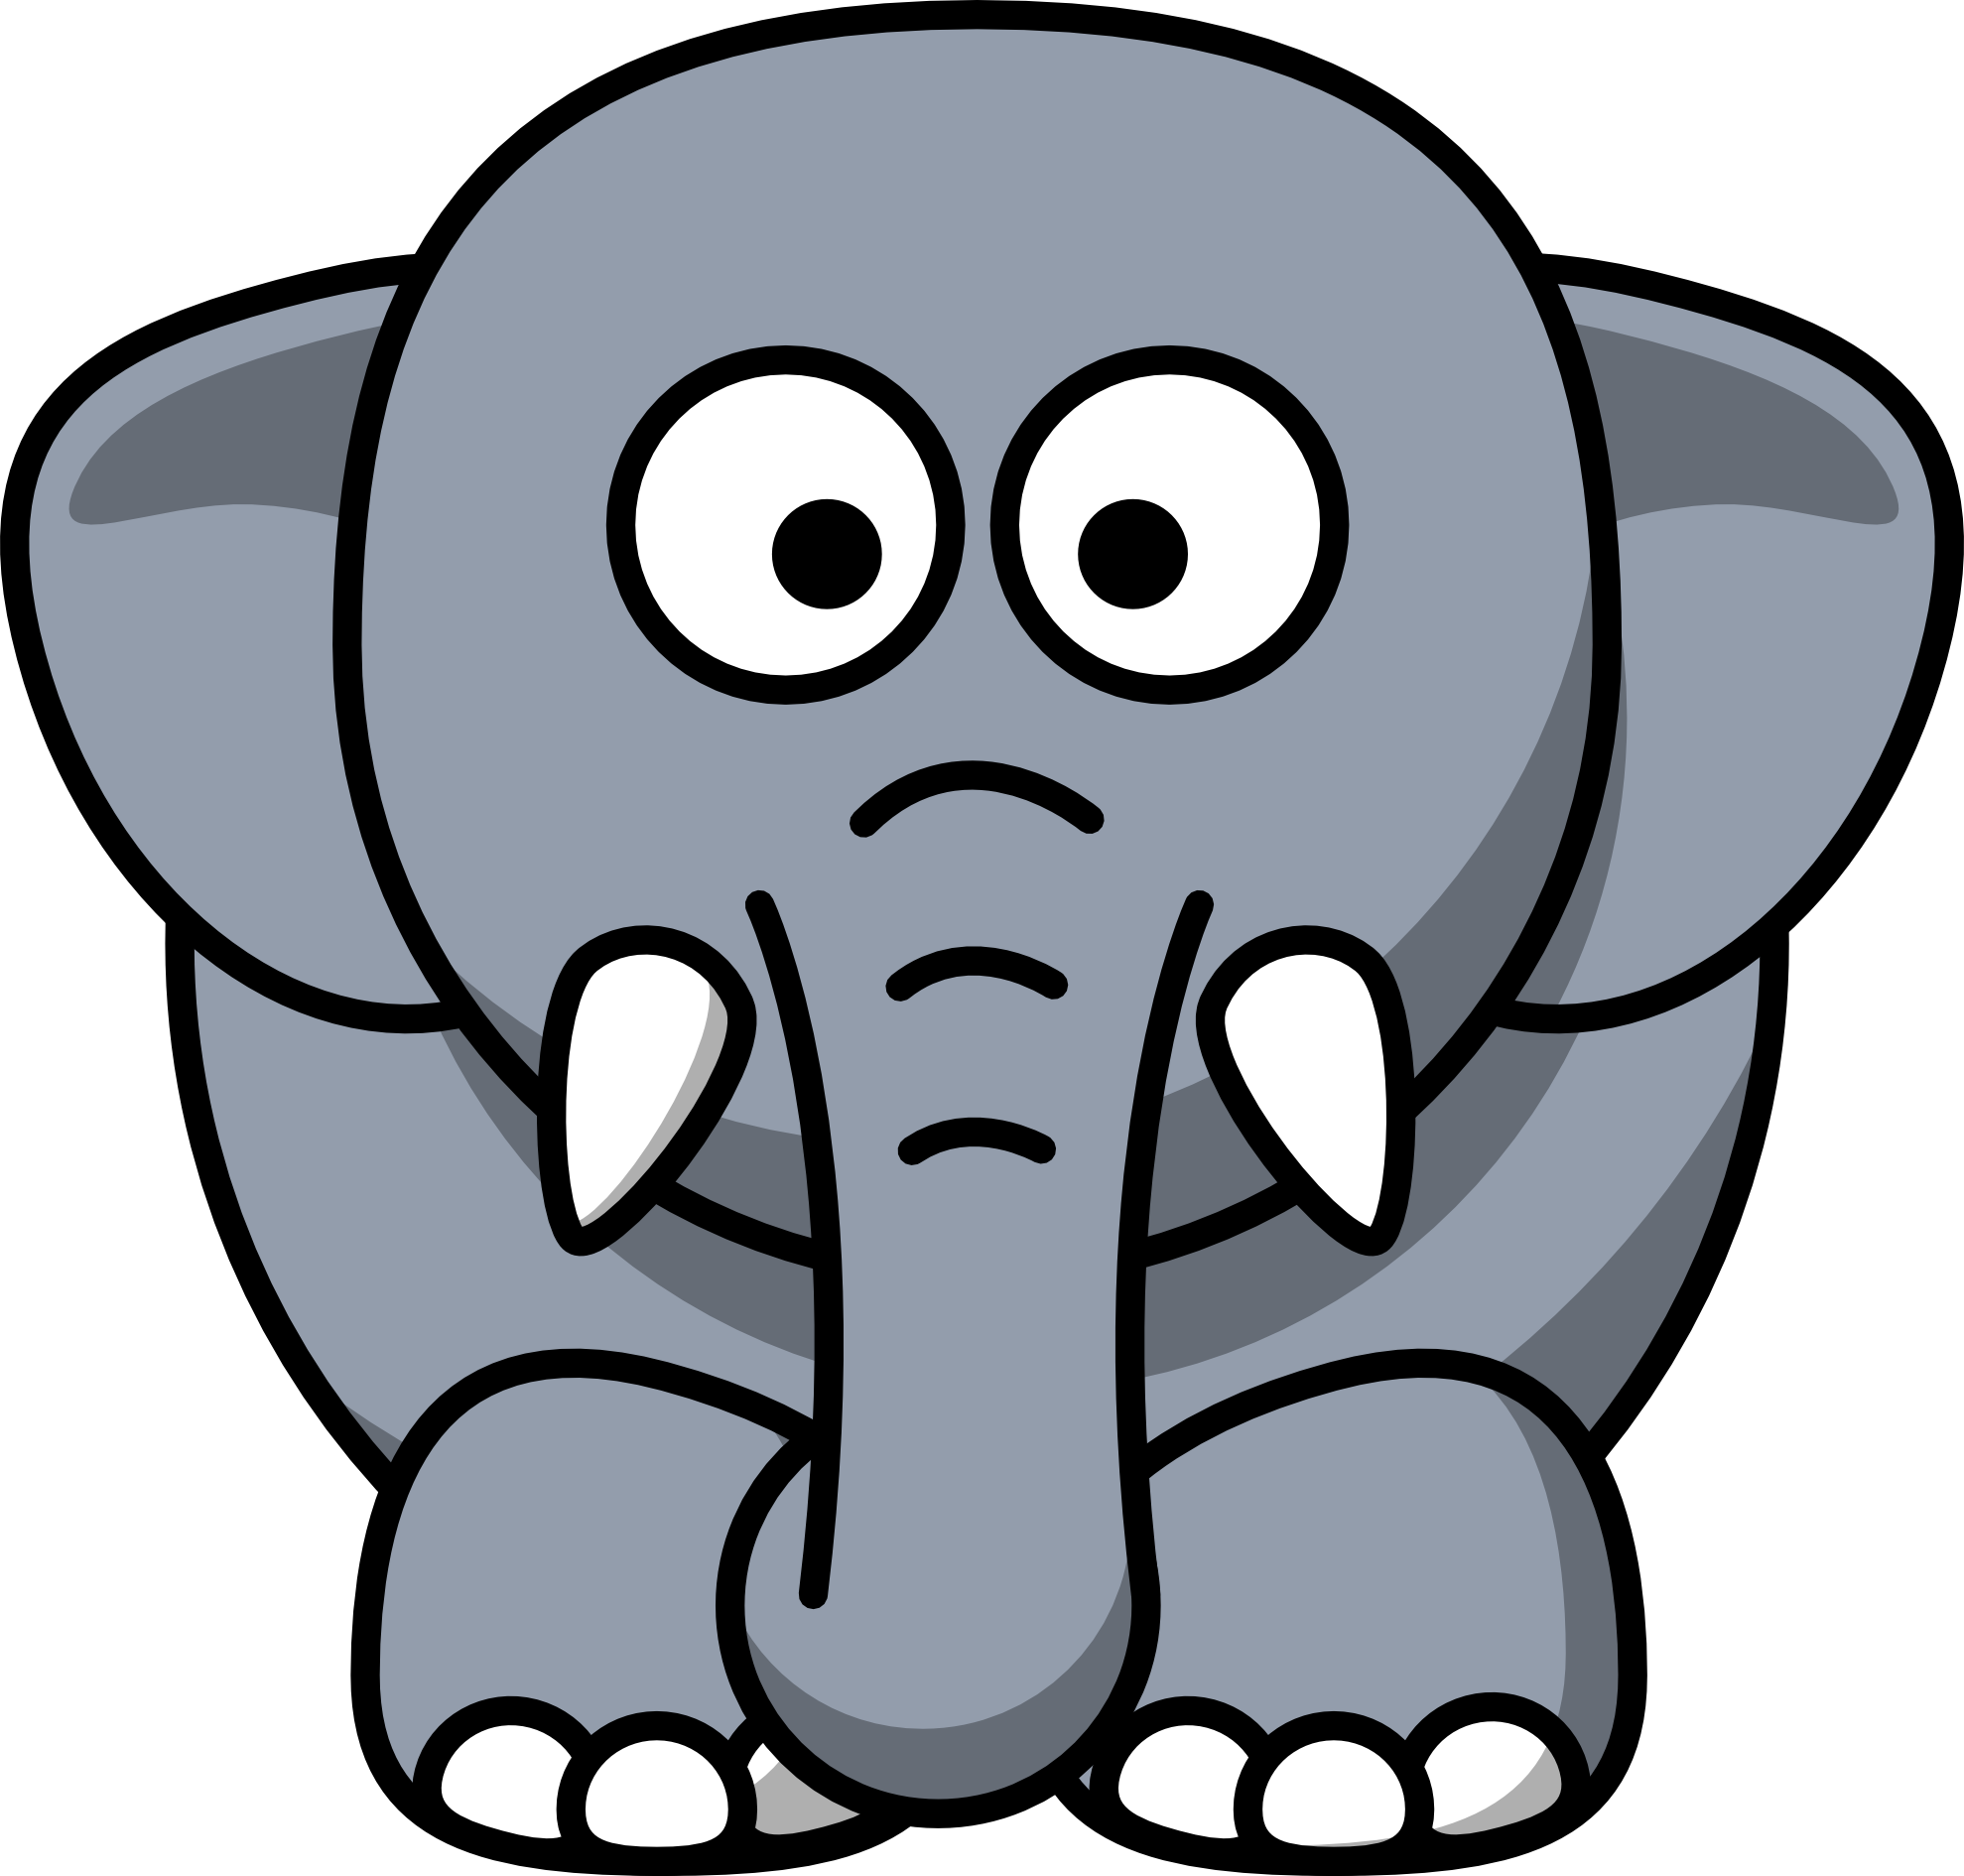 Elephant Clipart - Animal Wallpapers (75-Elephant Clipart - Animal Wallpapers (7503) ilikewalls clipartlook.com-12